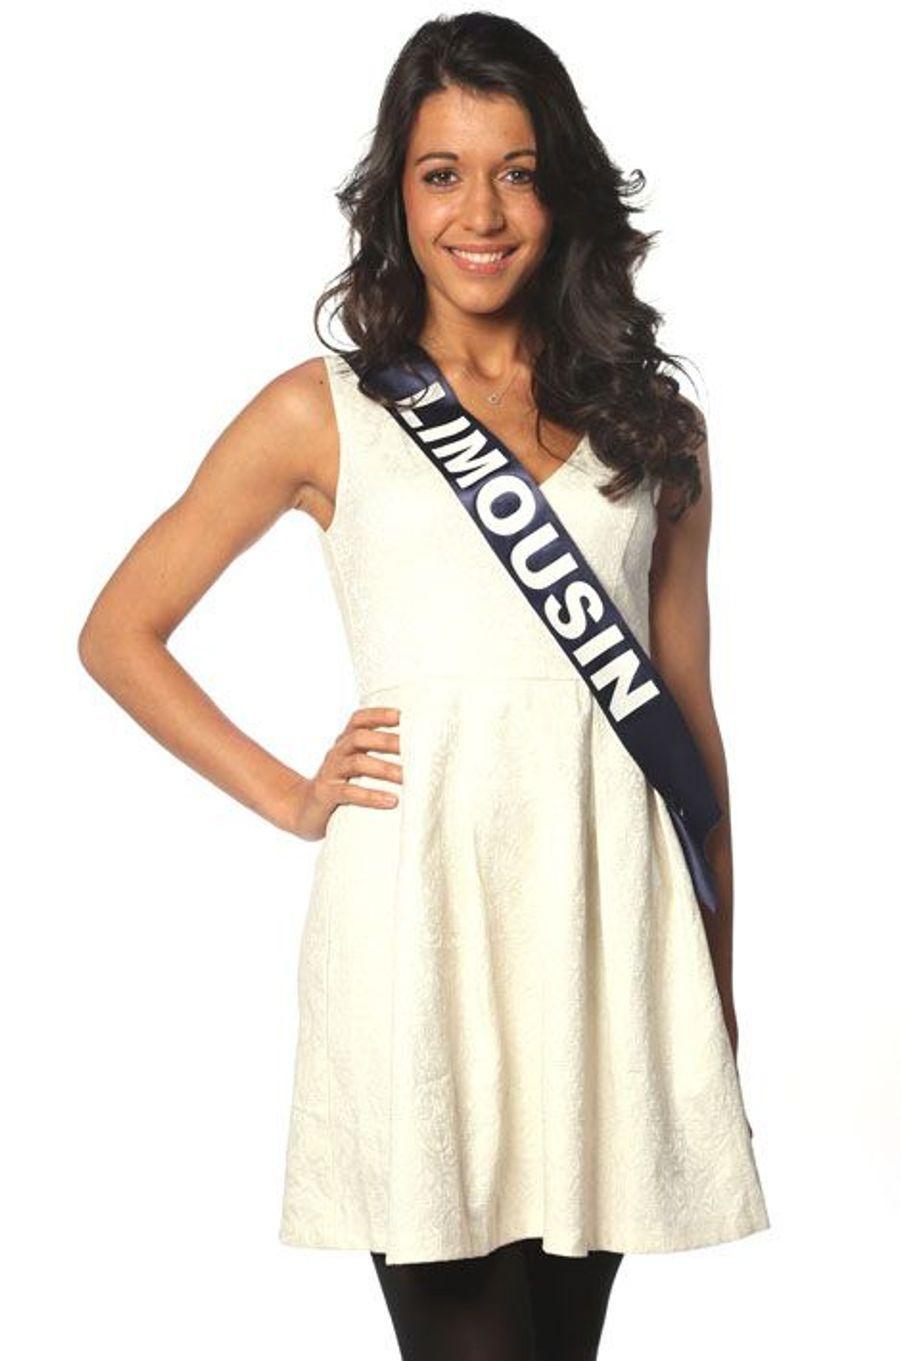 Caroline Dubreuil, 21 ans, Miss Limousin